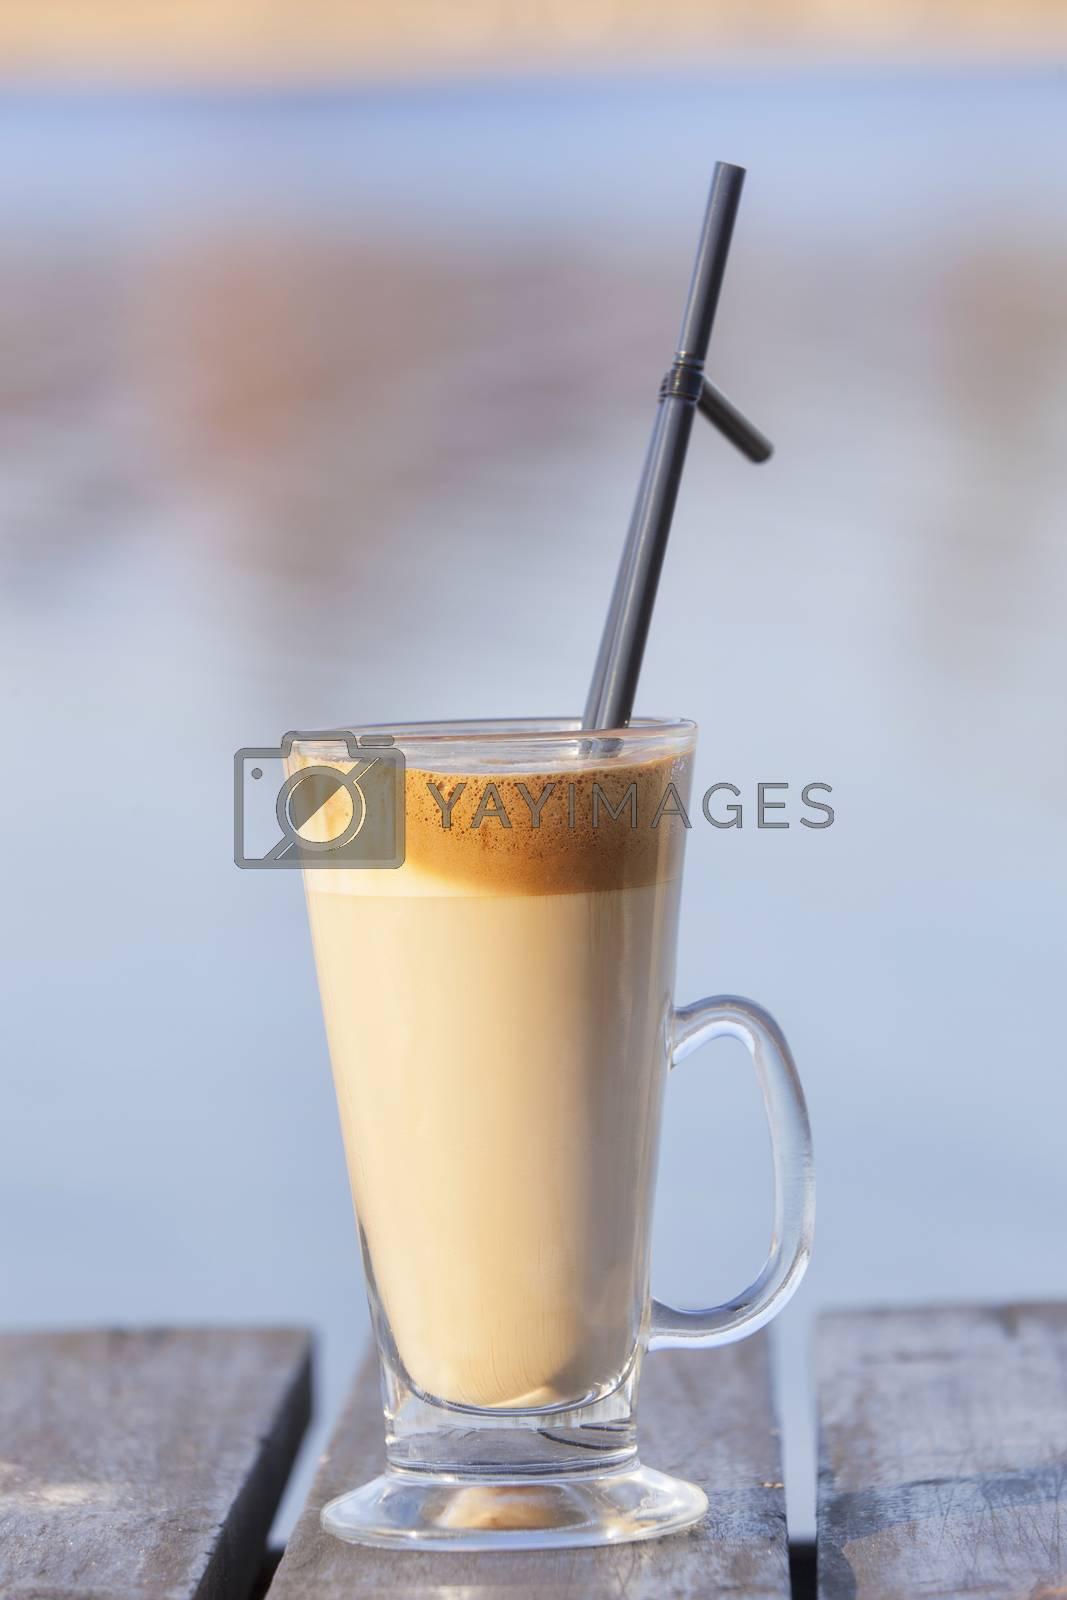 Iced coffee on table by Slast20